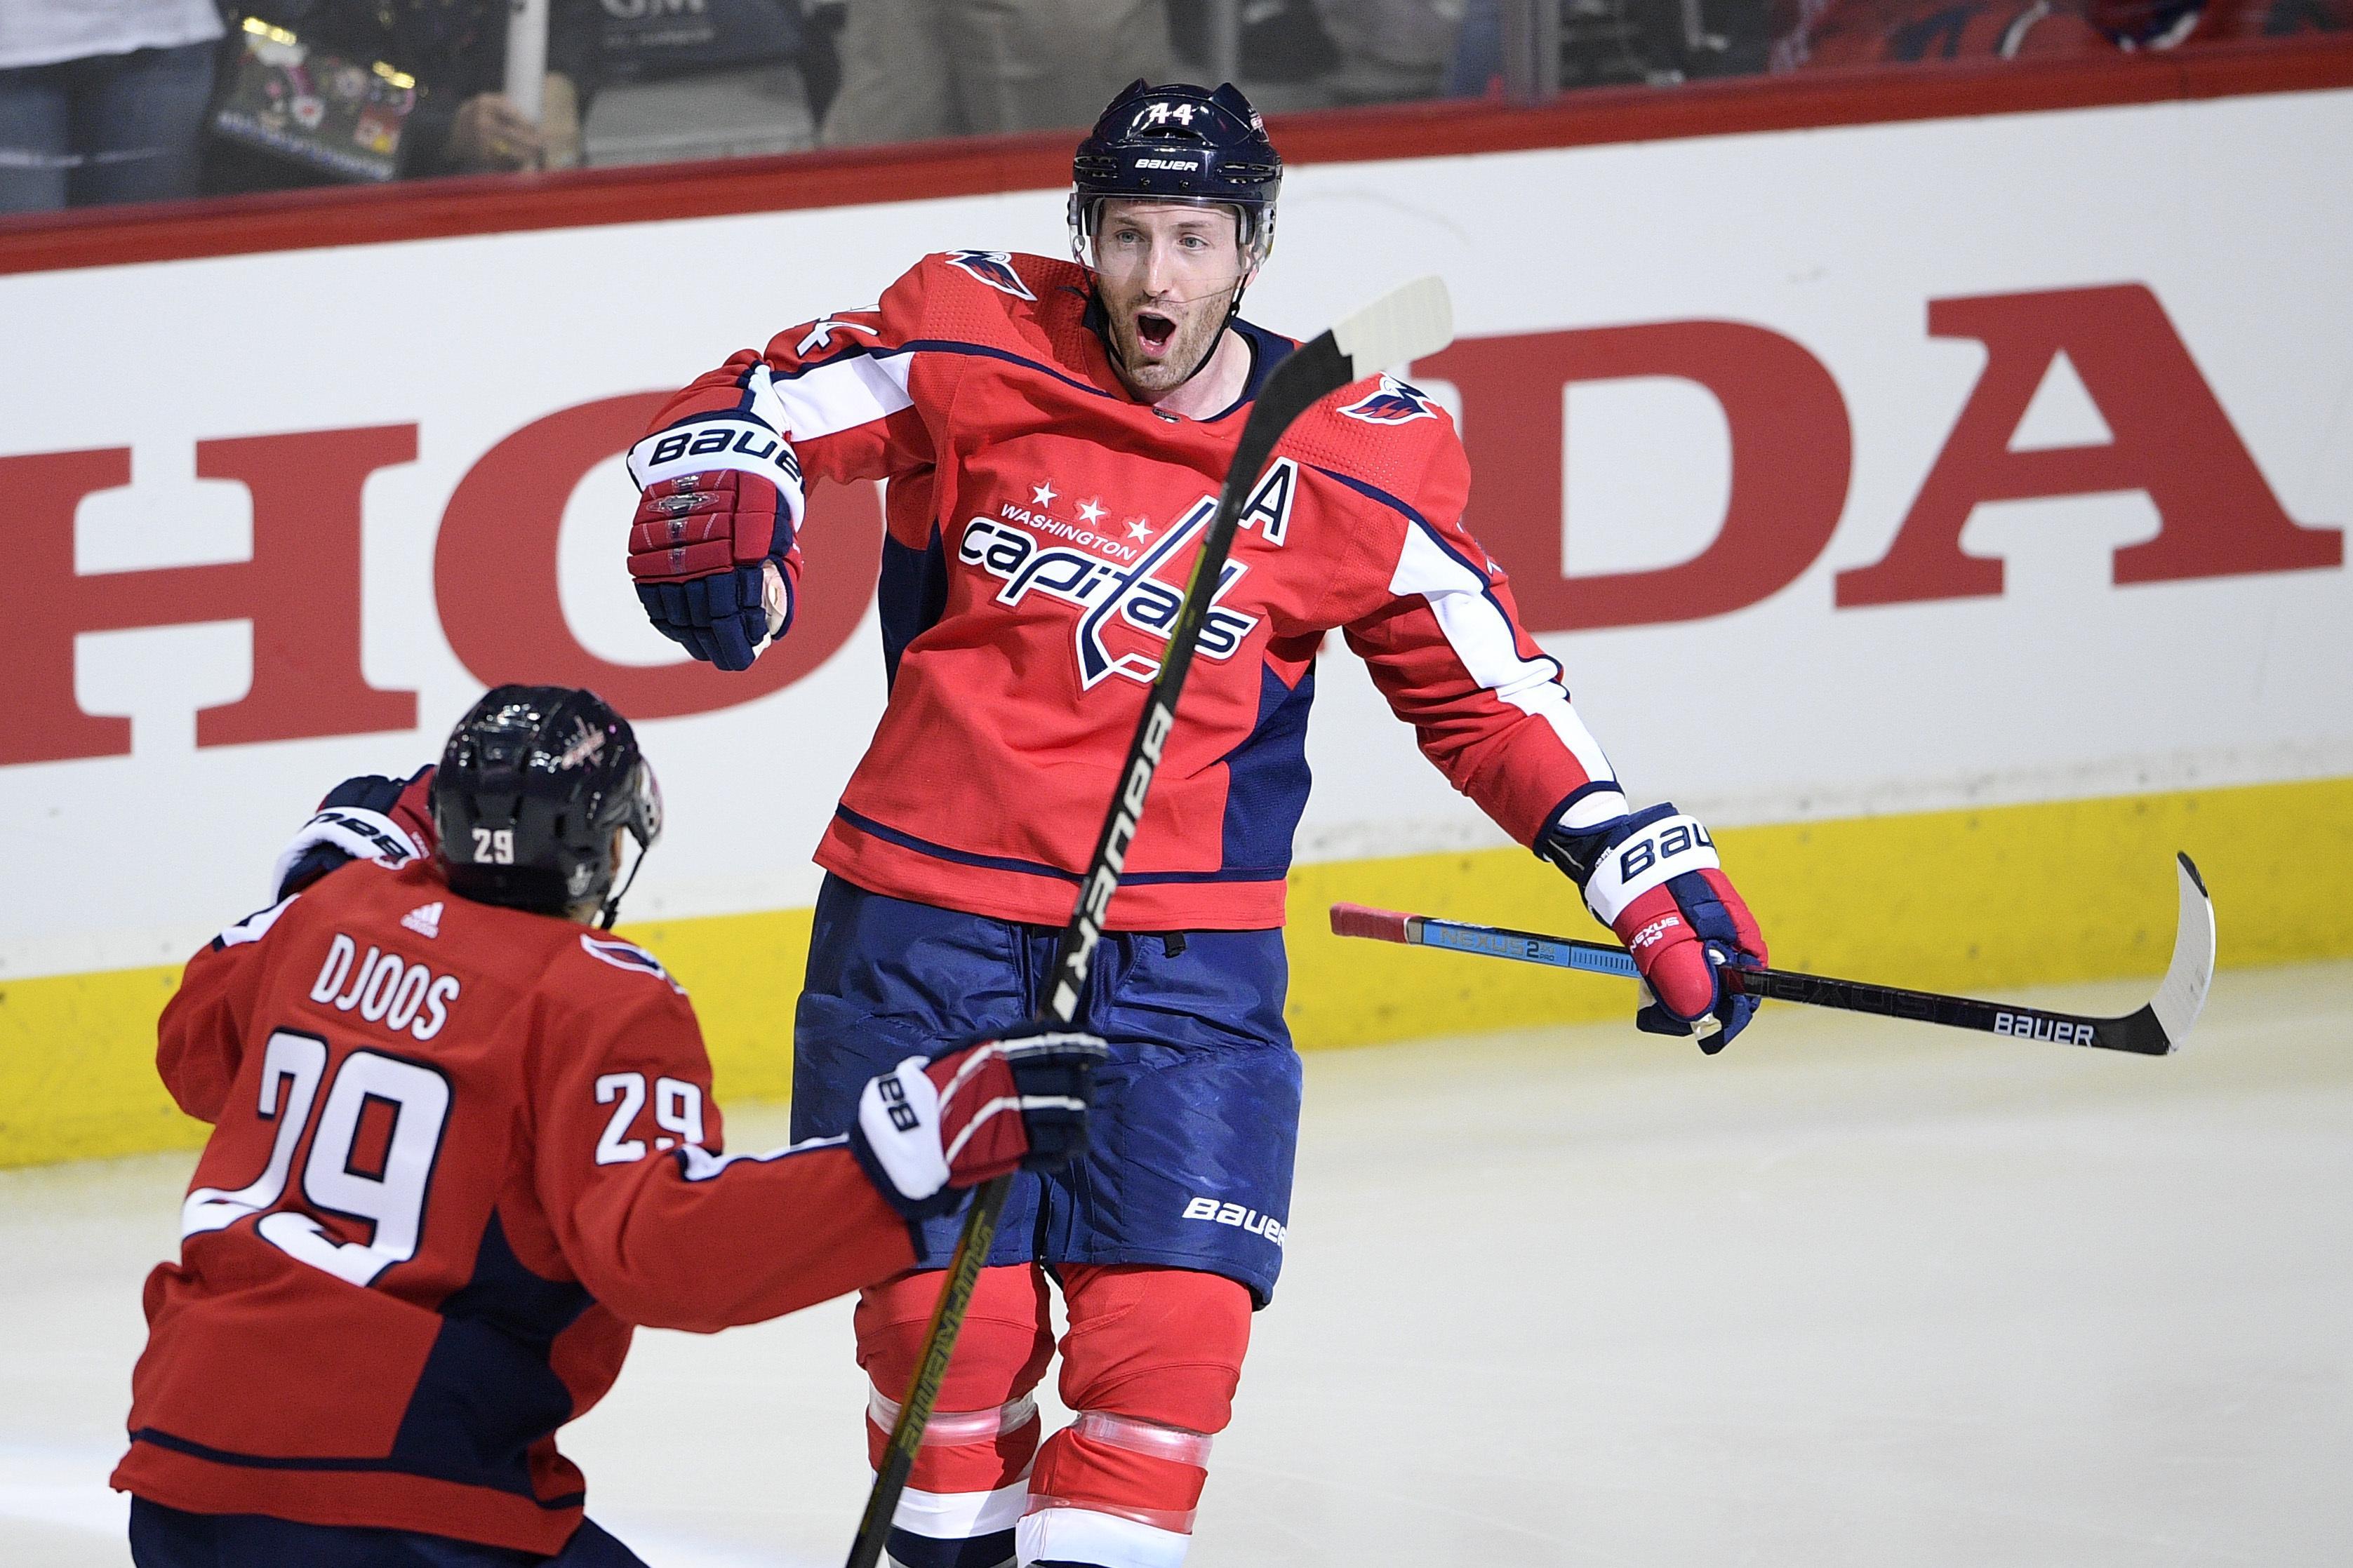 Brooks Orpik, Capitals defenseman, retires from NHL after 15 seasons